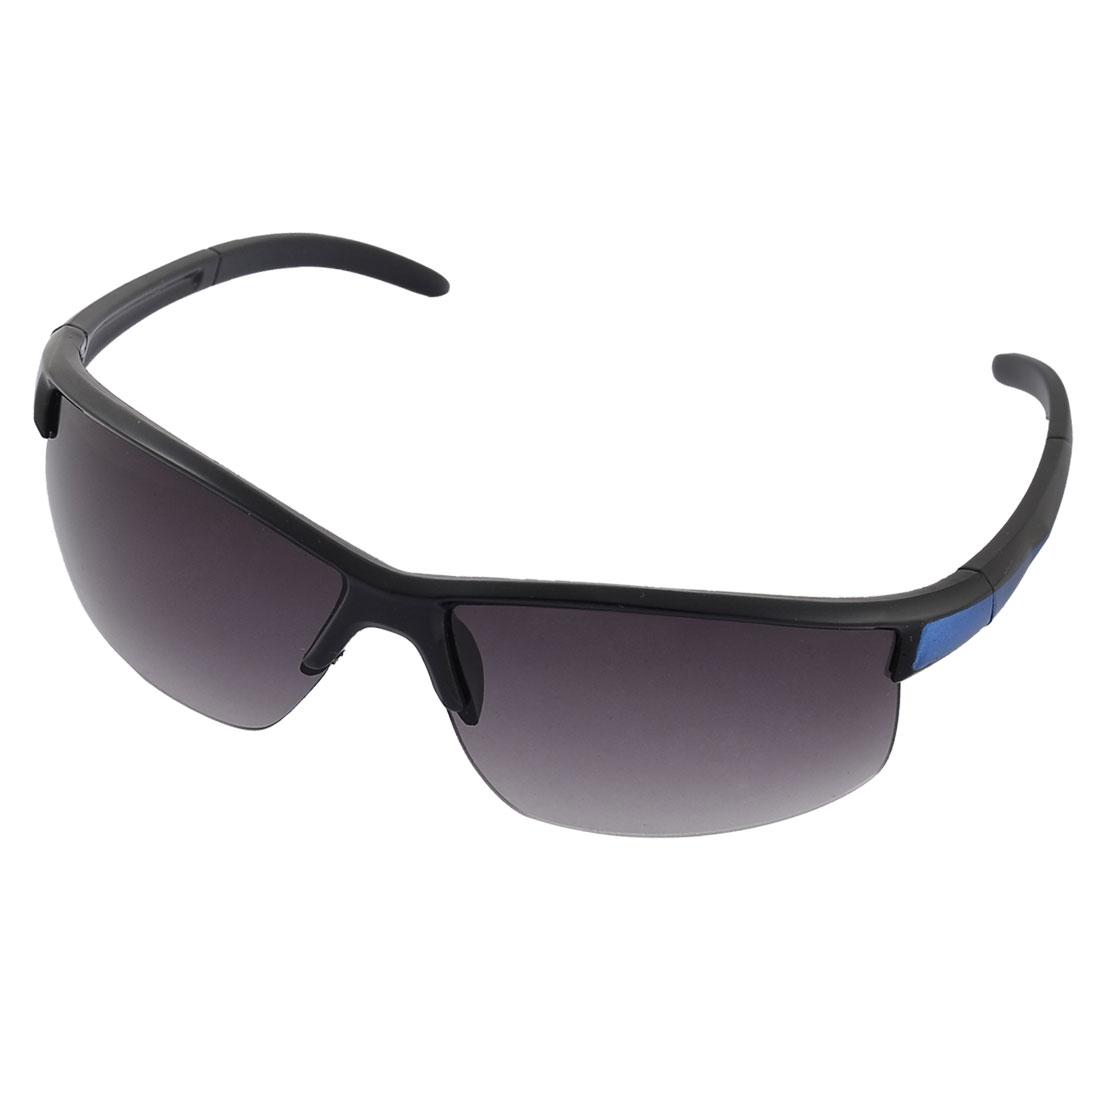 Unisex Plastic Half Rimless Colored Lens Sports Sunglasses Glasses Black Blue